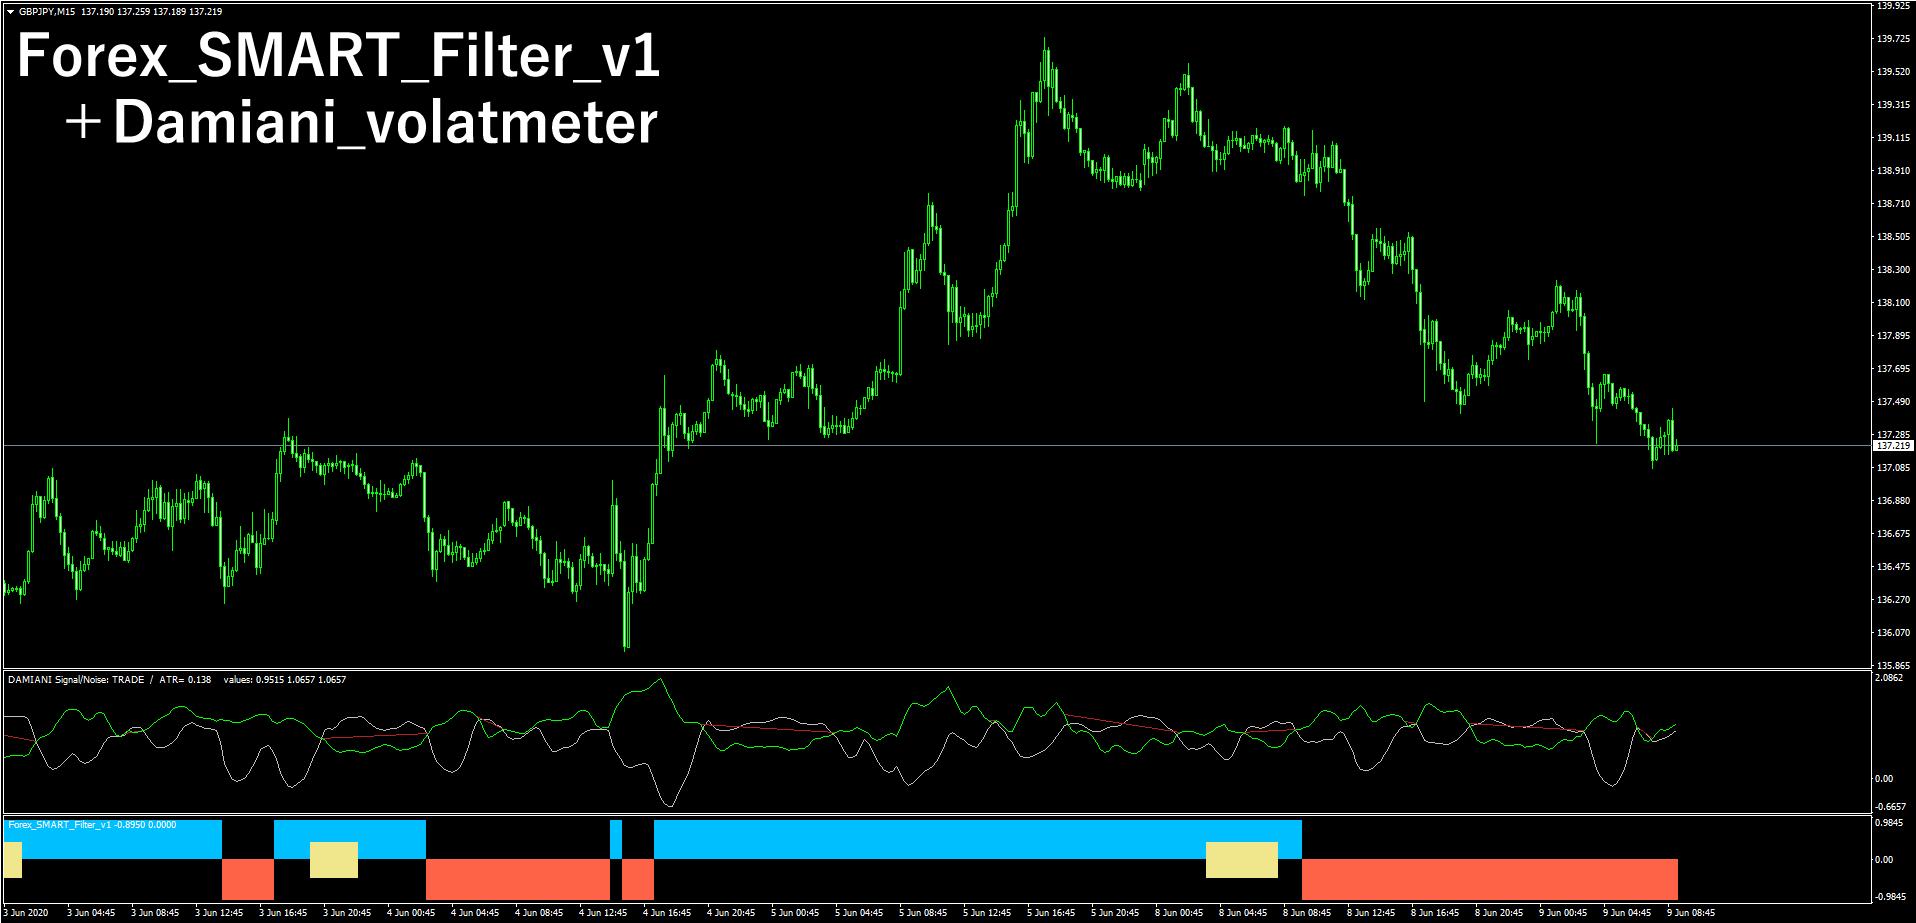 「Damiani_volatmeter」と「Forex_SMART_Filter_v1」の2つを表示させたポンド円15分足チャート